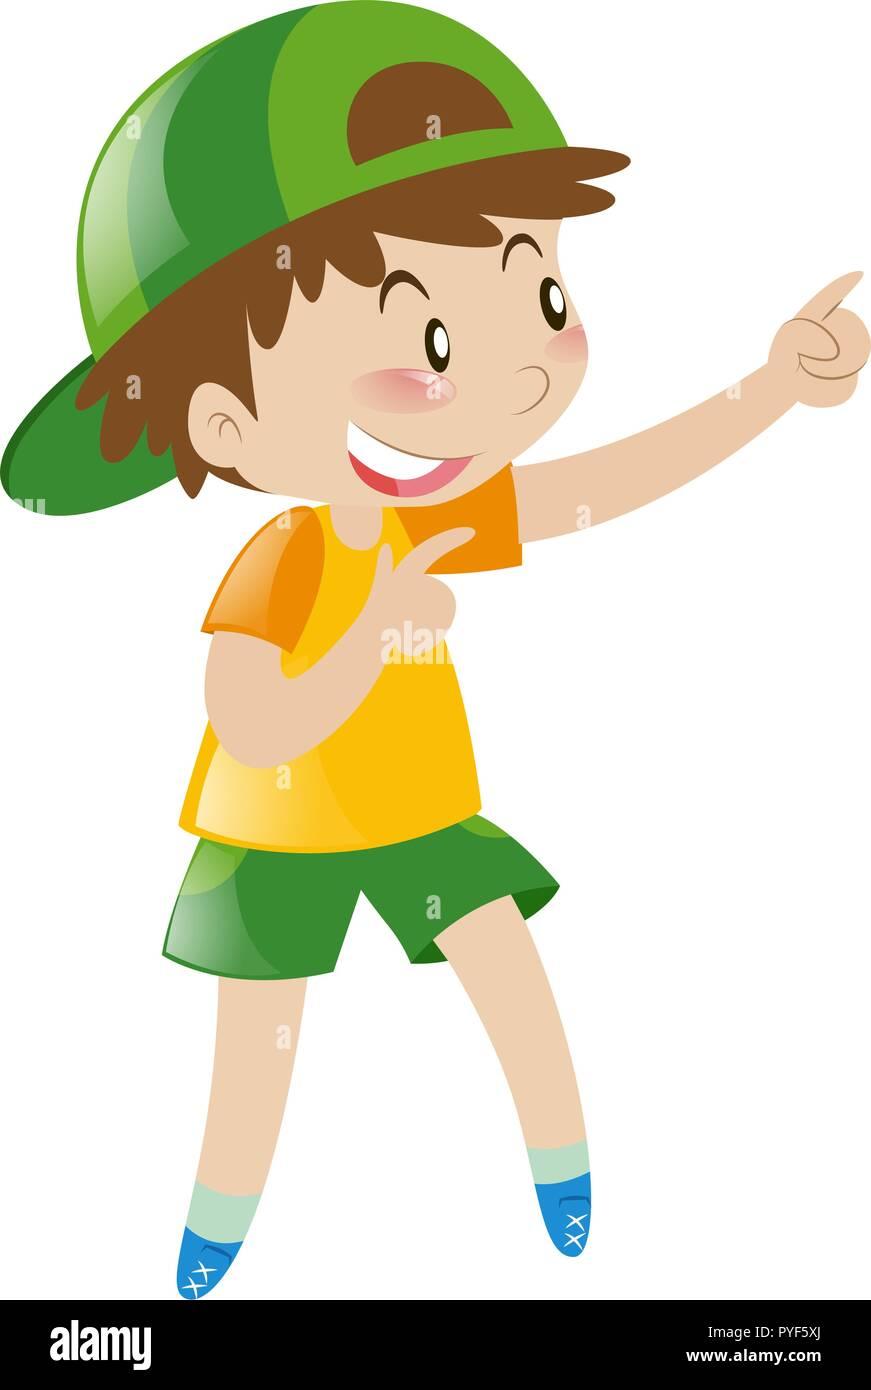 Little boy pointing finger at something illustration - Stock Vector